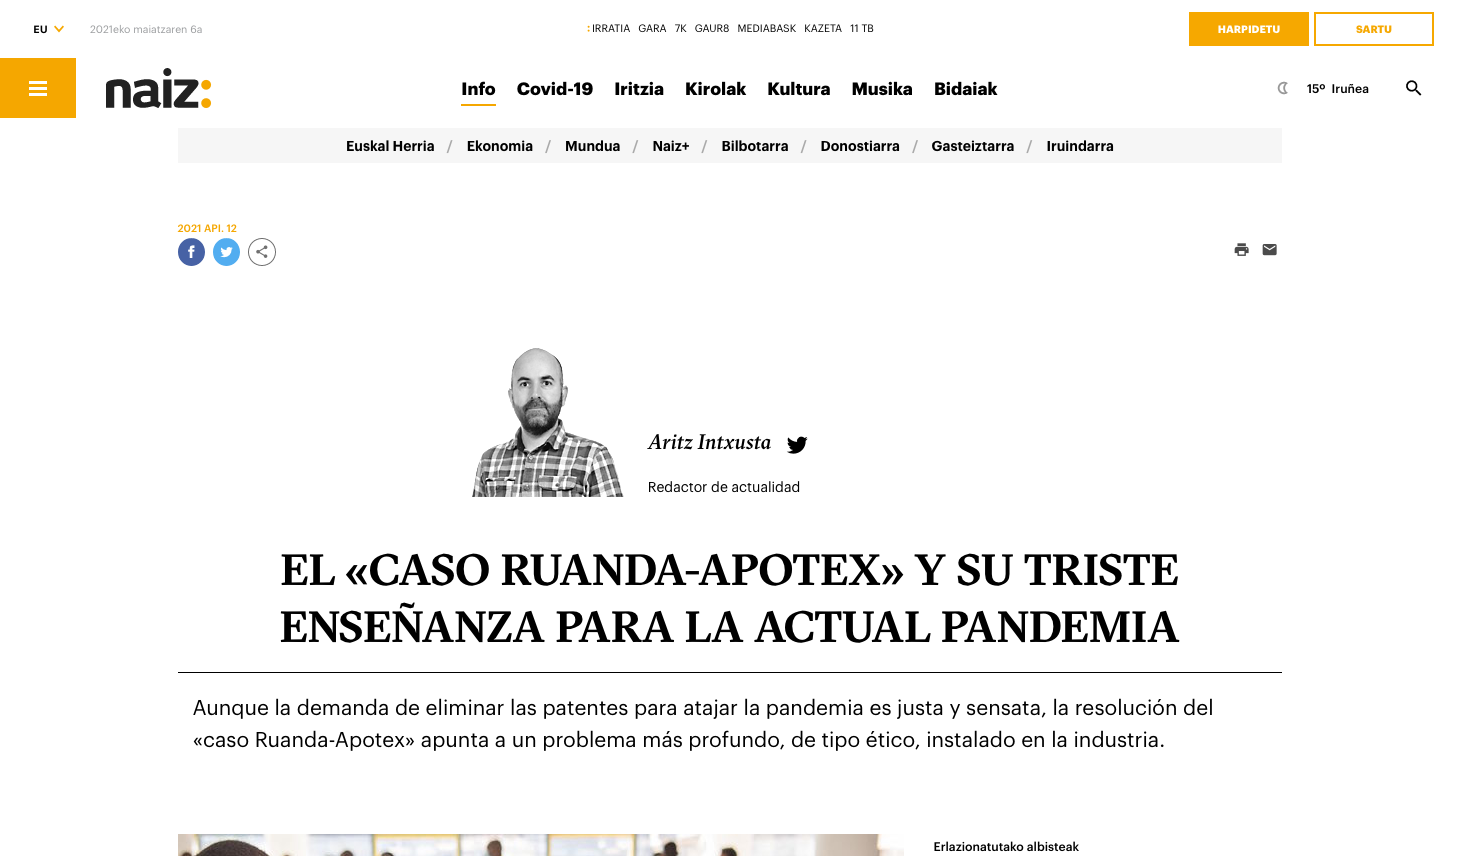 El caso Ruanda-Apotex